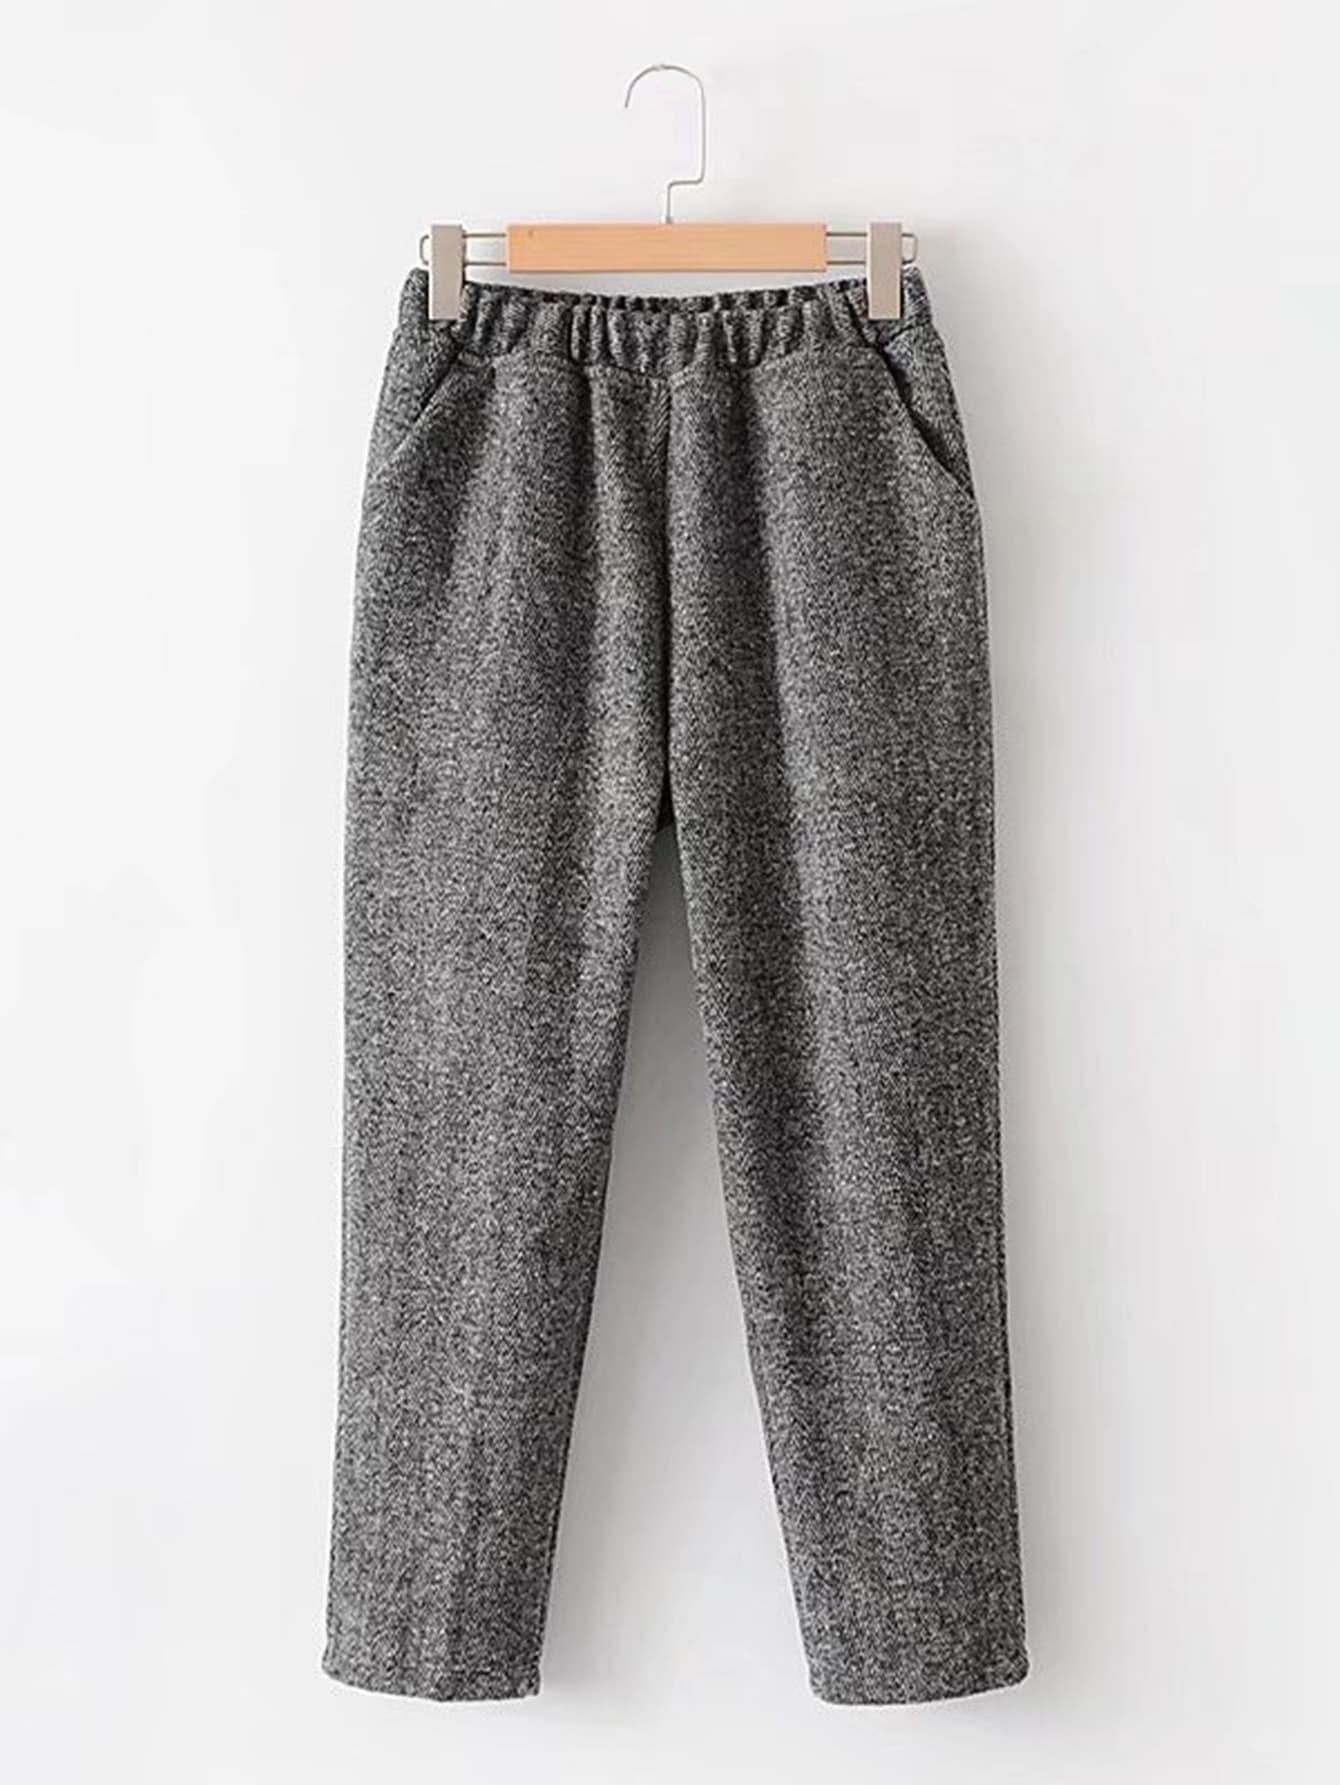 Image of Wool Blend Chevron Pants